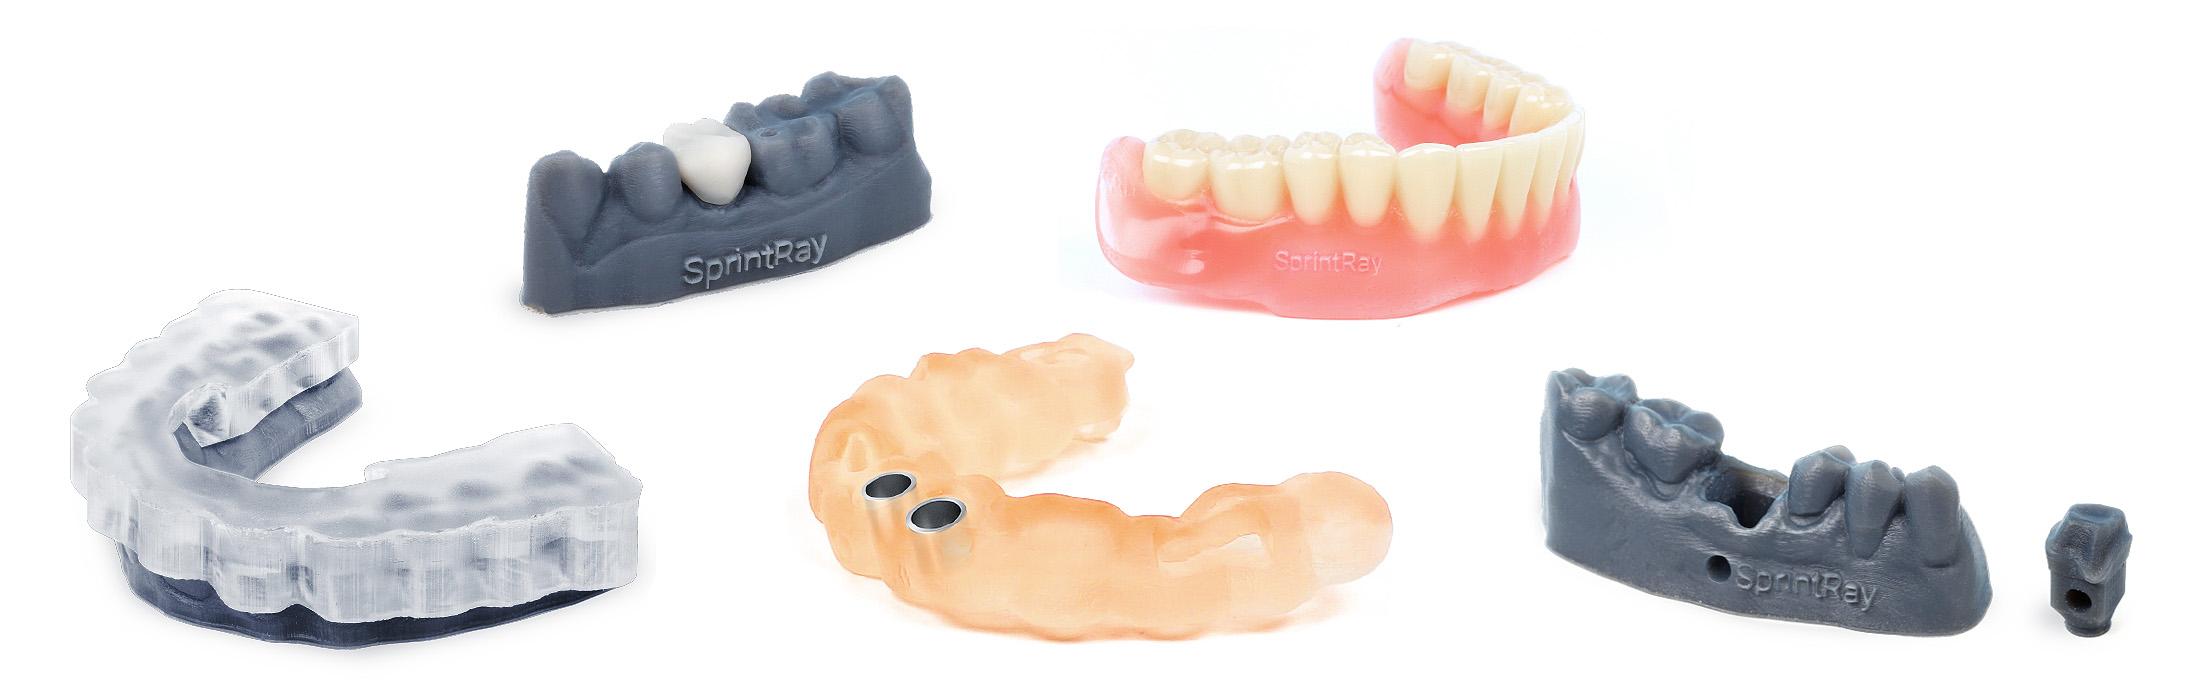 sprintray-dental-applications-hero-2.jpg